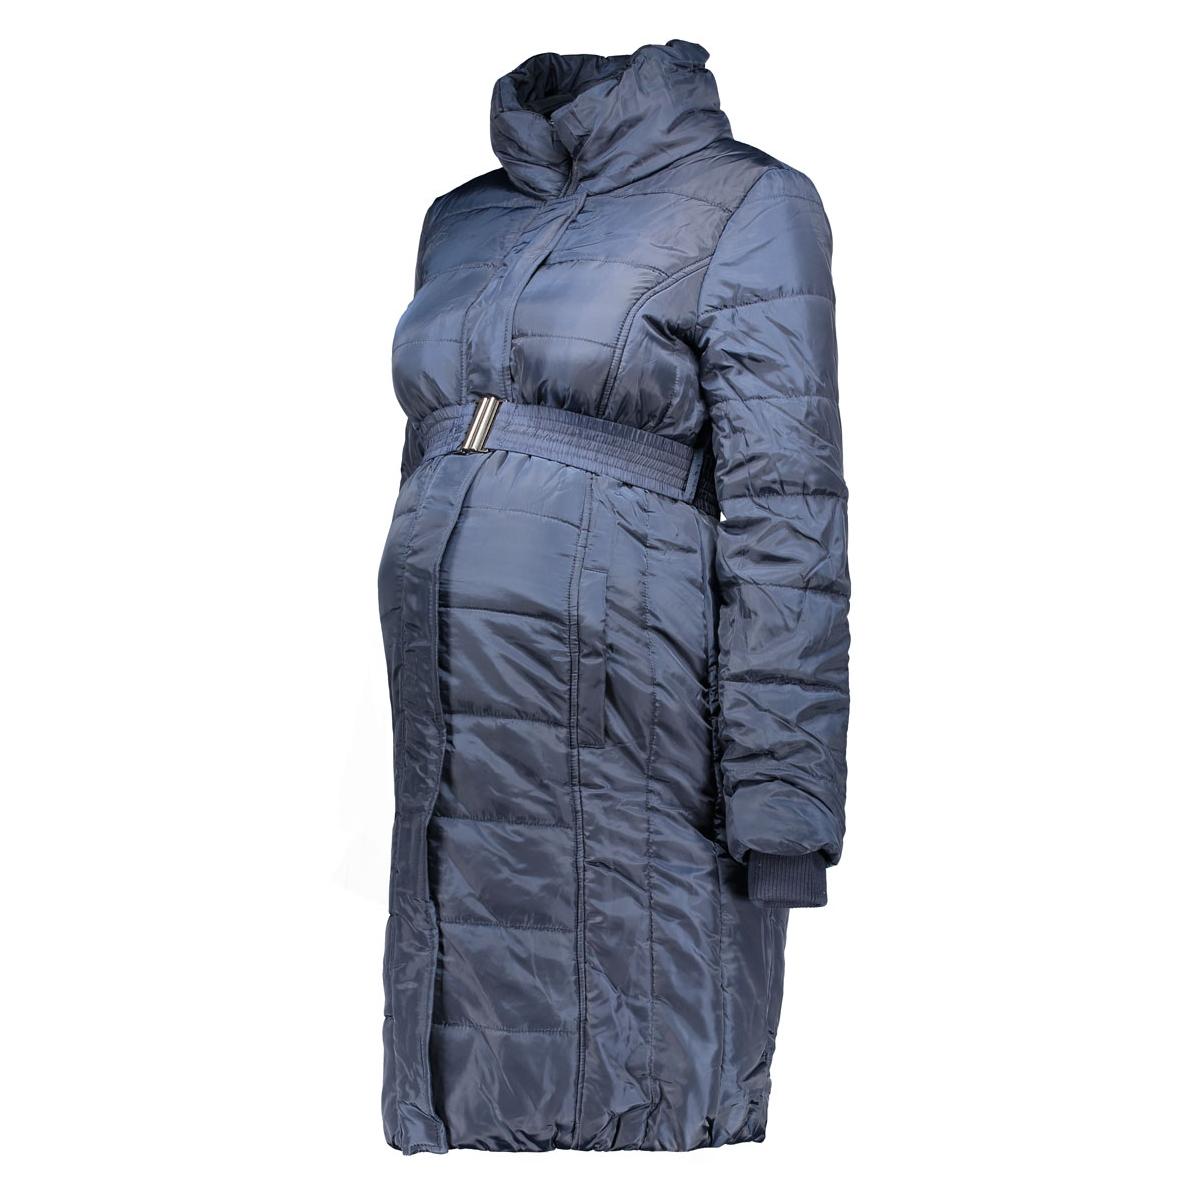 mlquilty l/s padded coat 20006289 mama-licious positie jas navy blazer